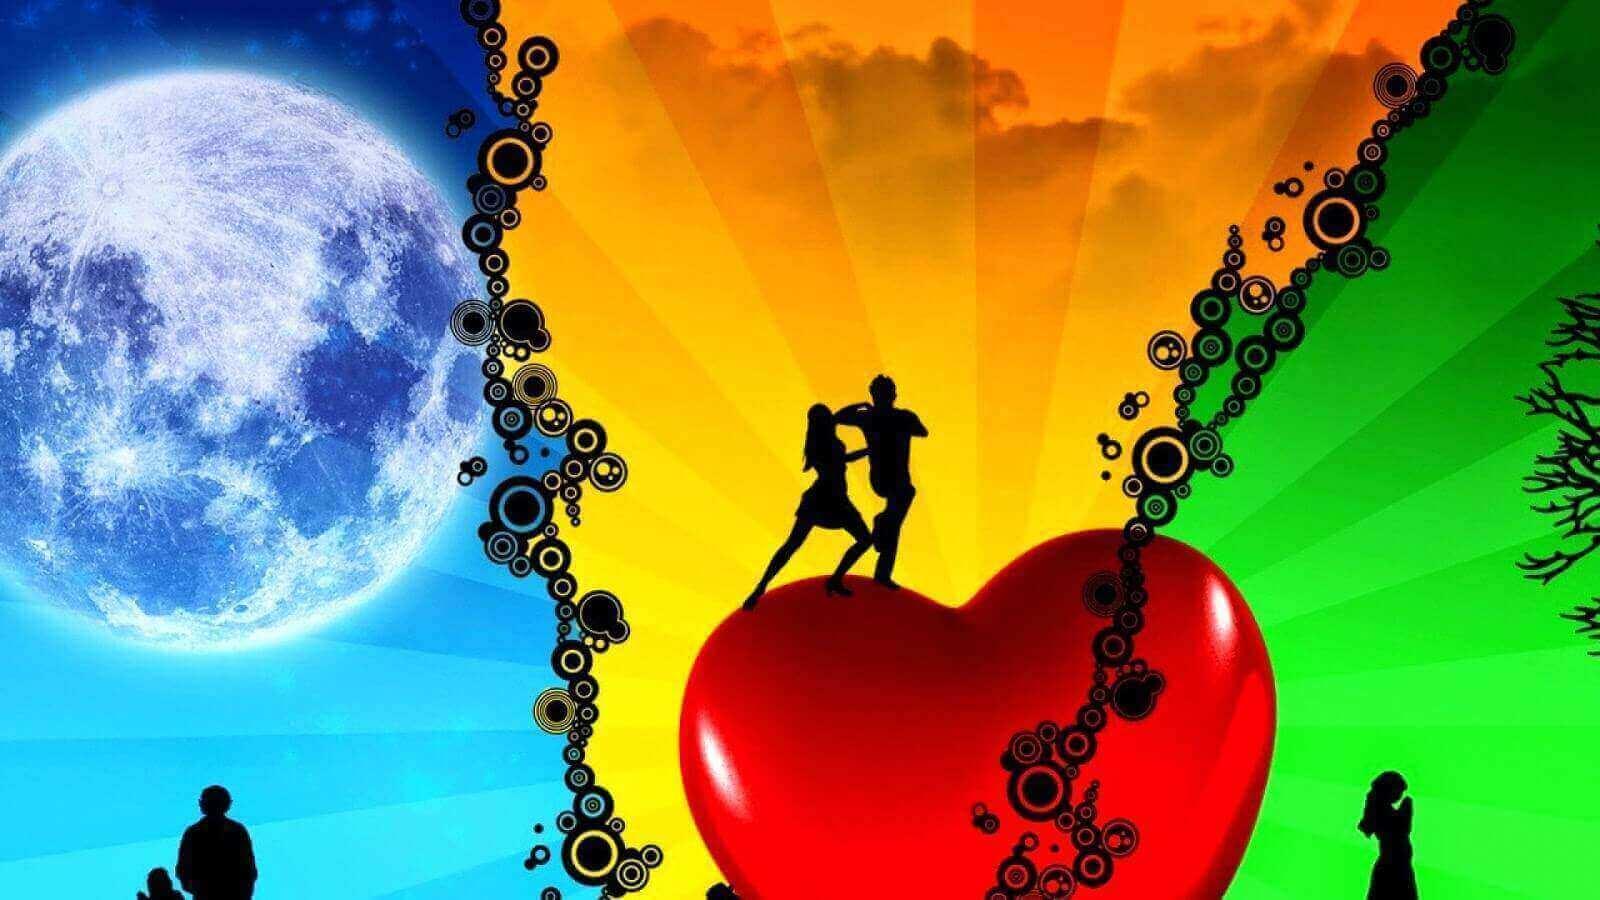 Download Wallpaper Hd High Quality Love 185904 Hd Wallpaper